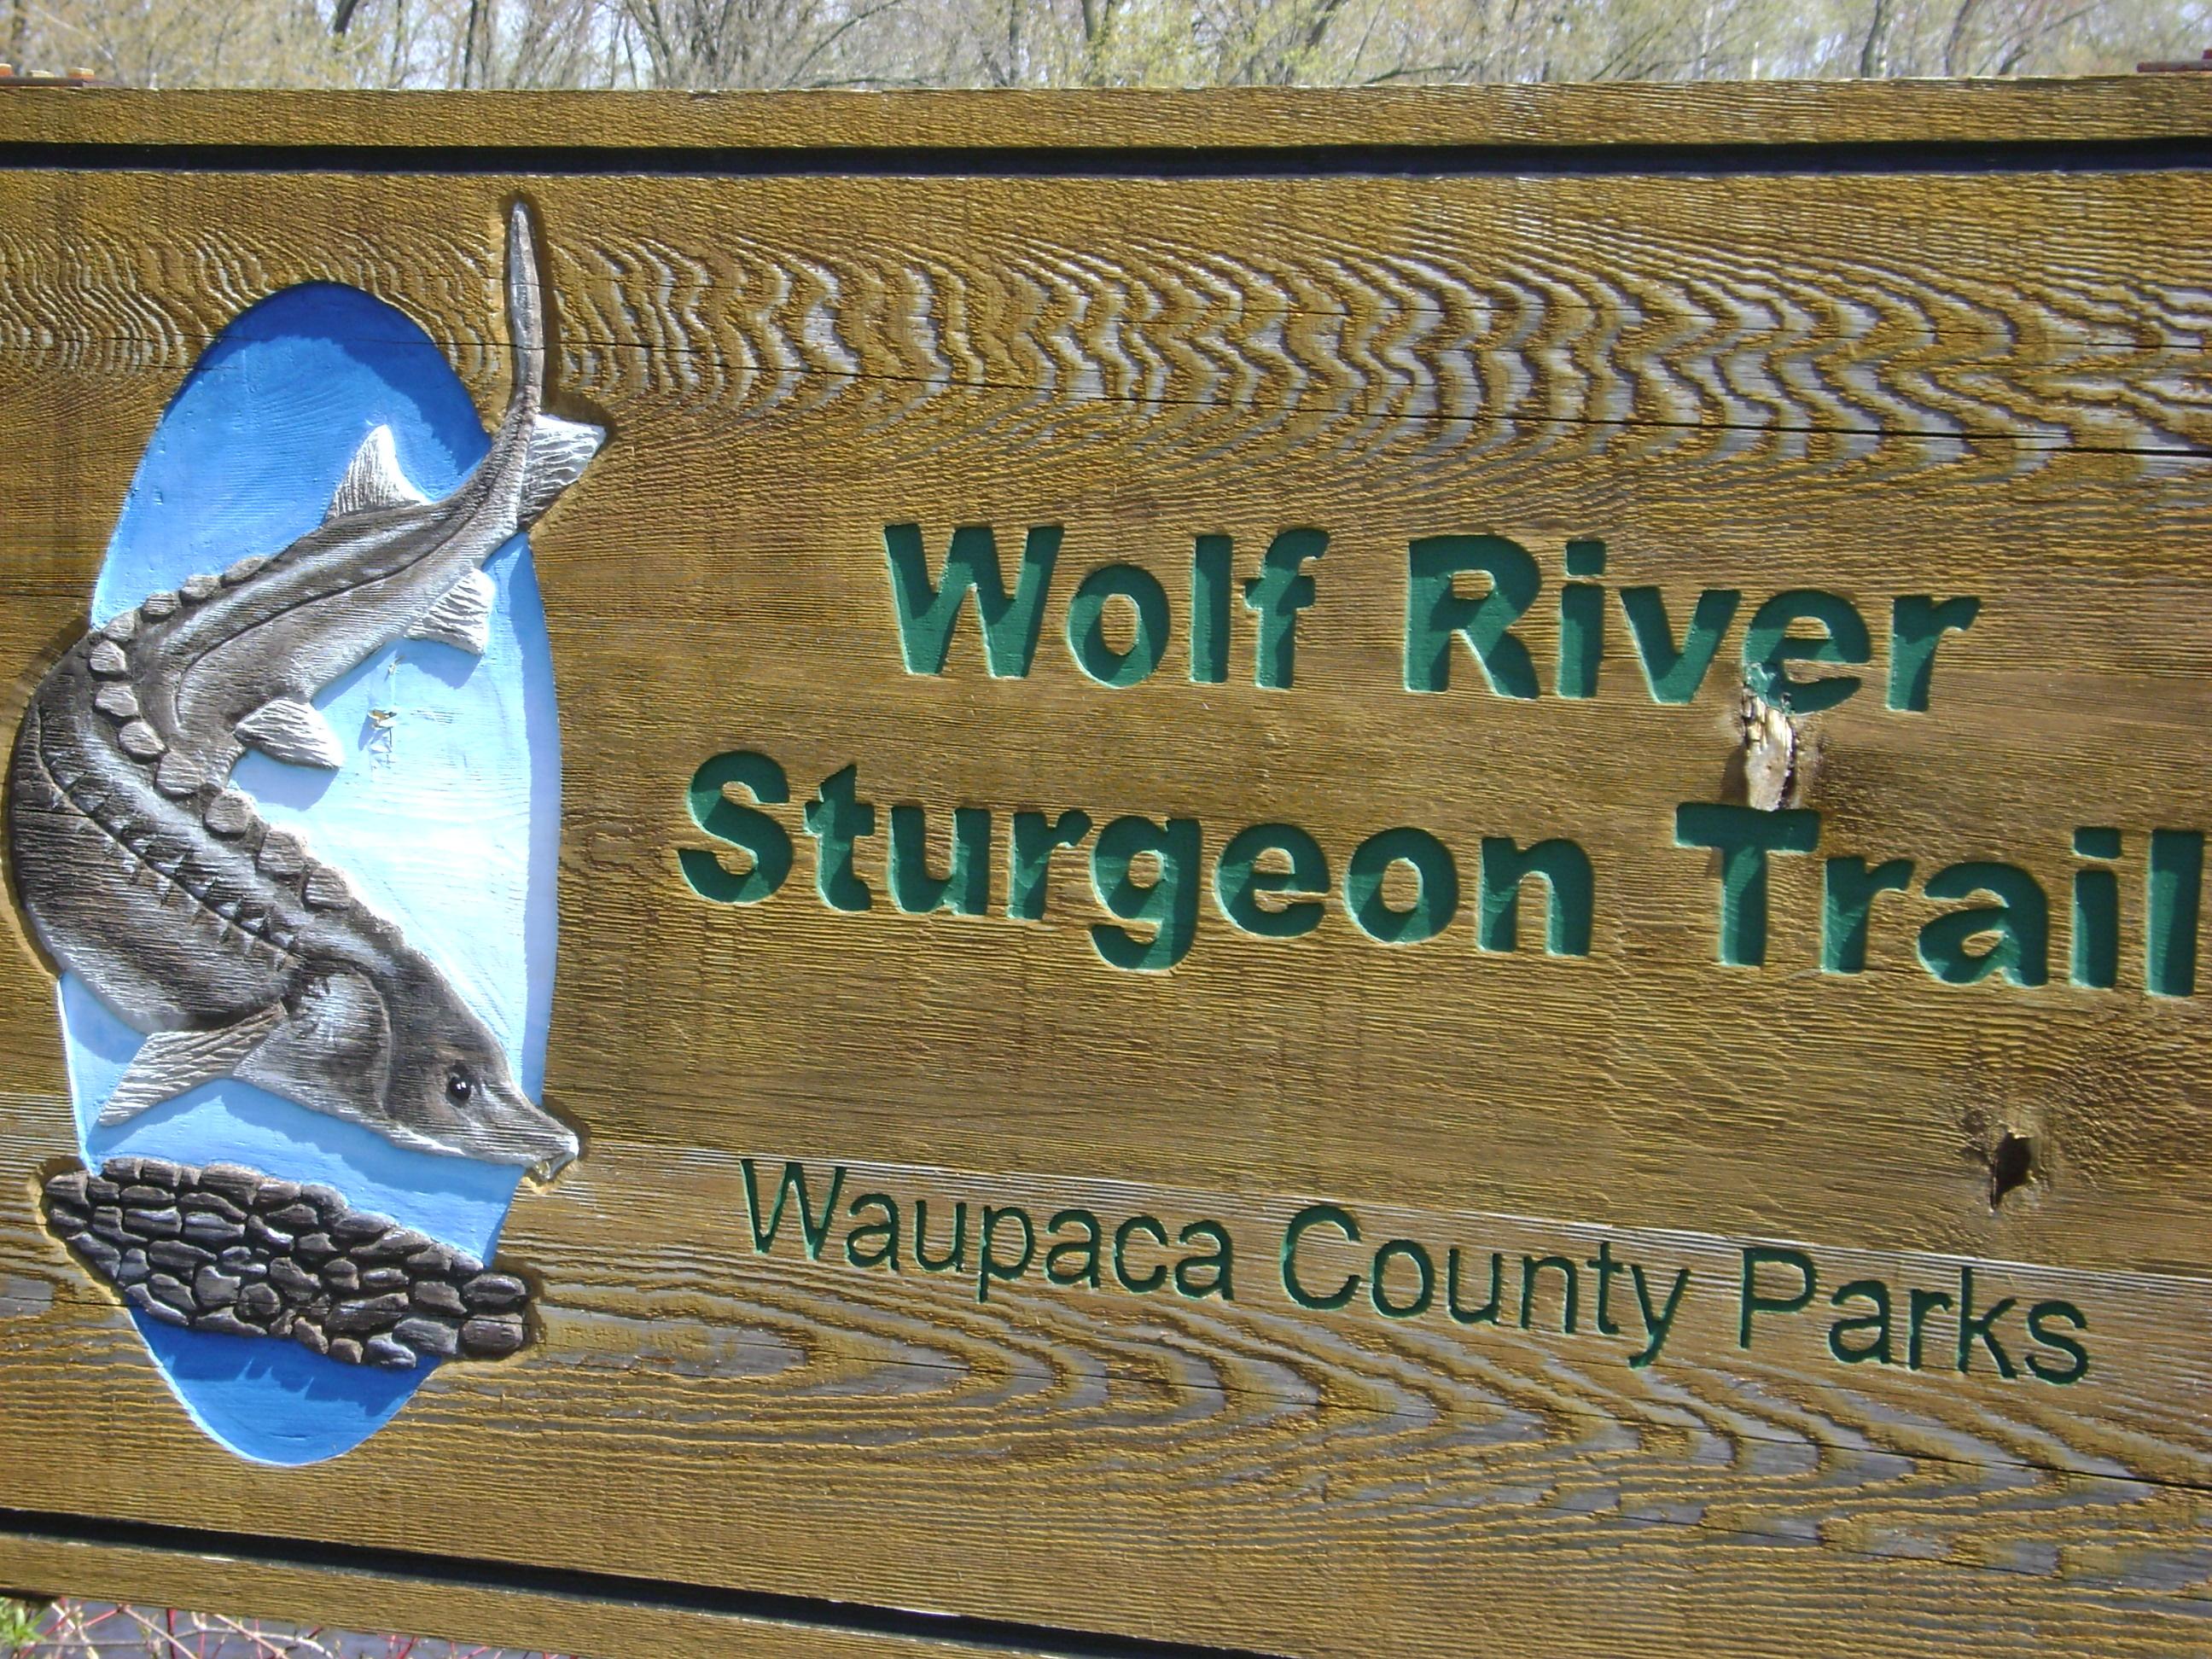 Following the Sturgeon Trail in NE Wisconsin